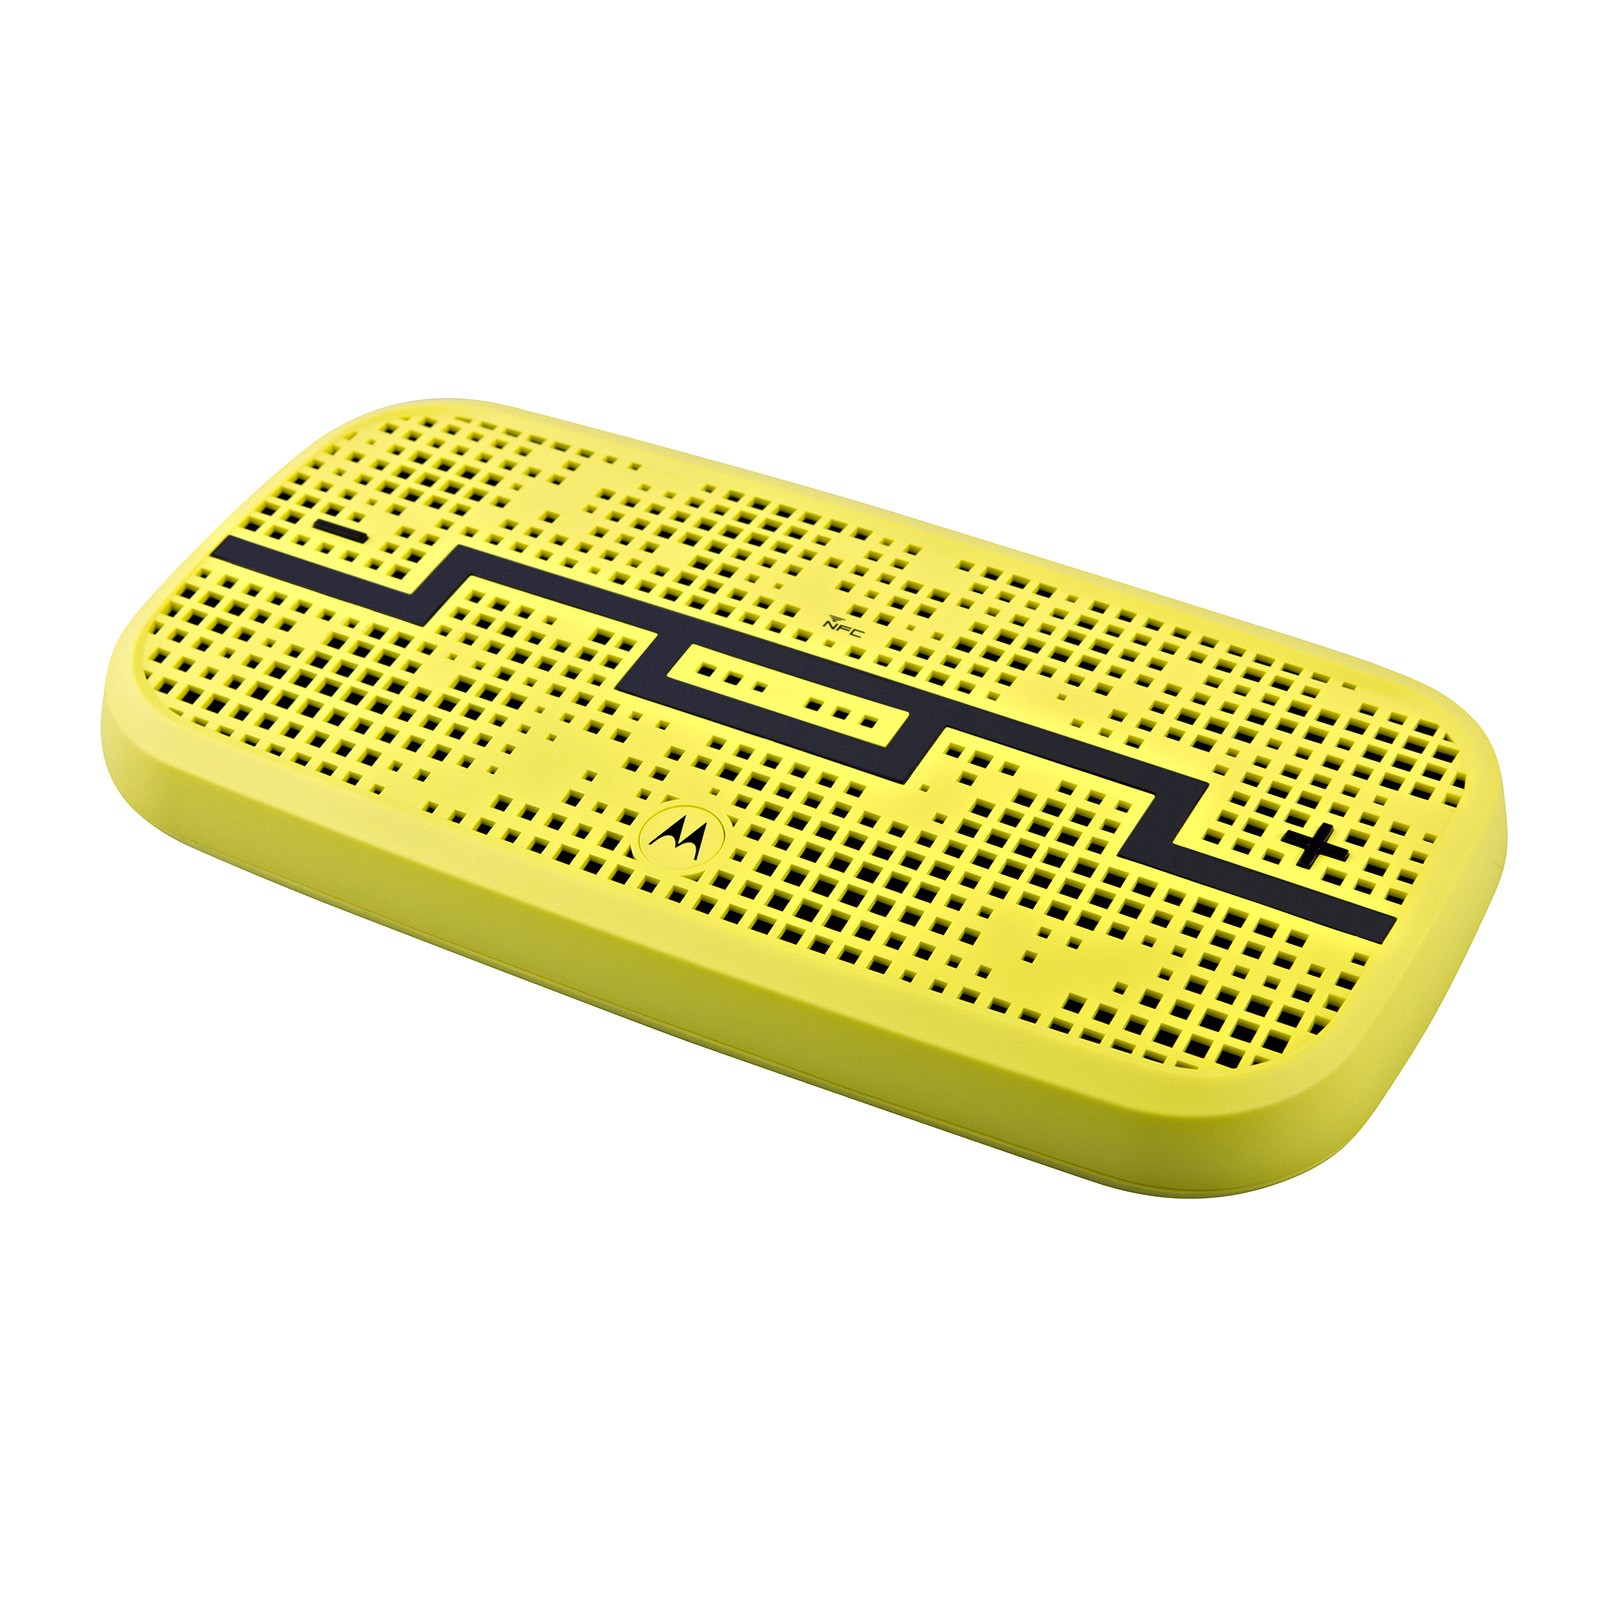 Save $106 on this bluetooth speaker (Photo via eBay)